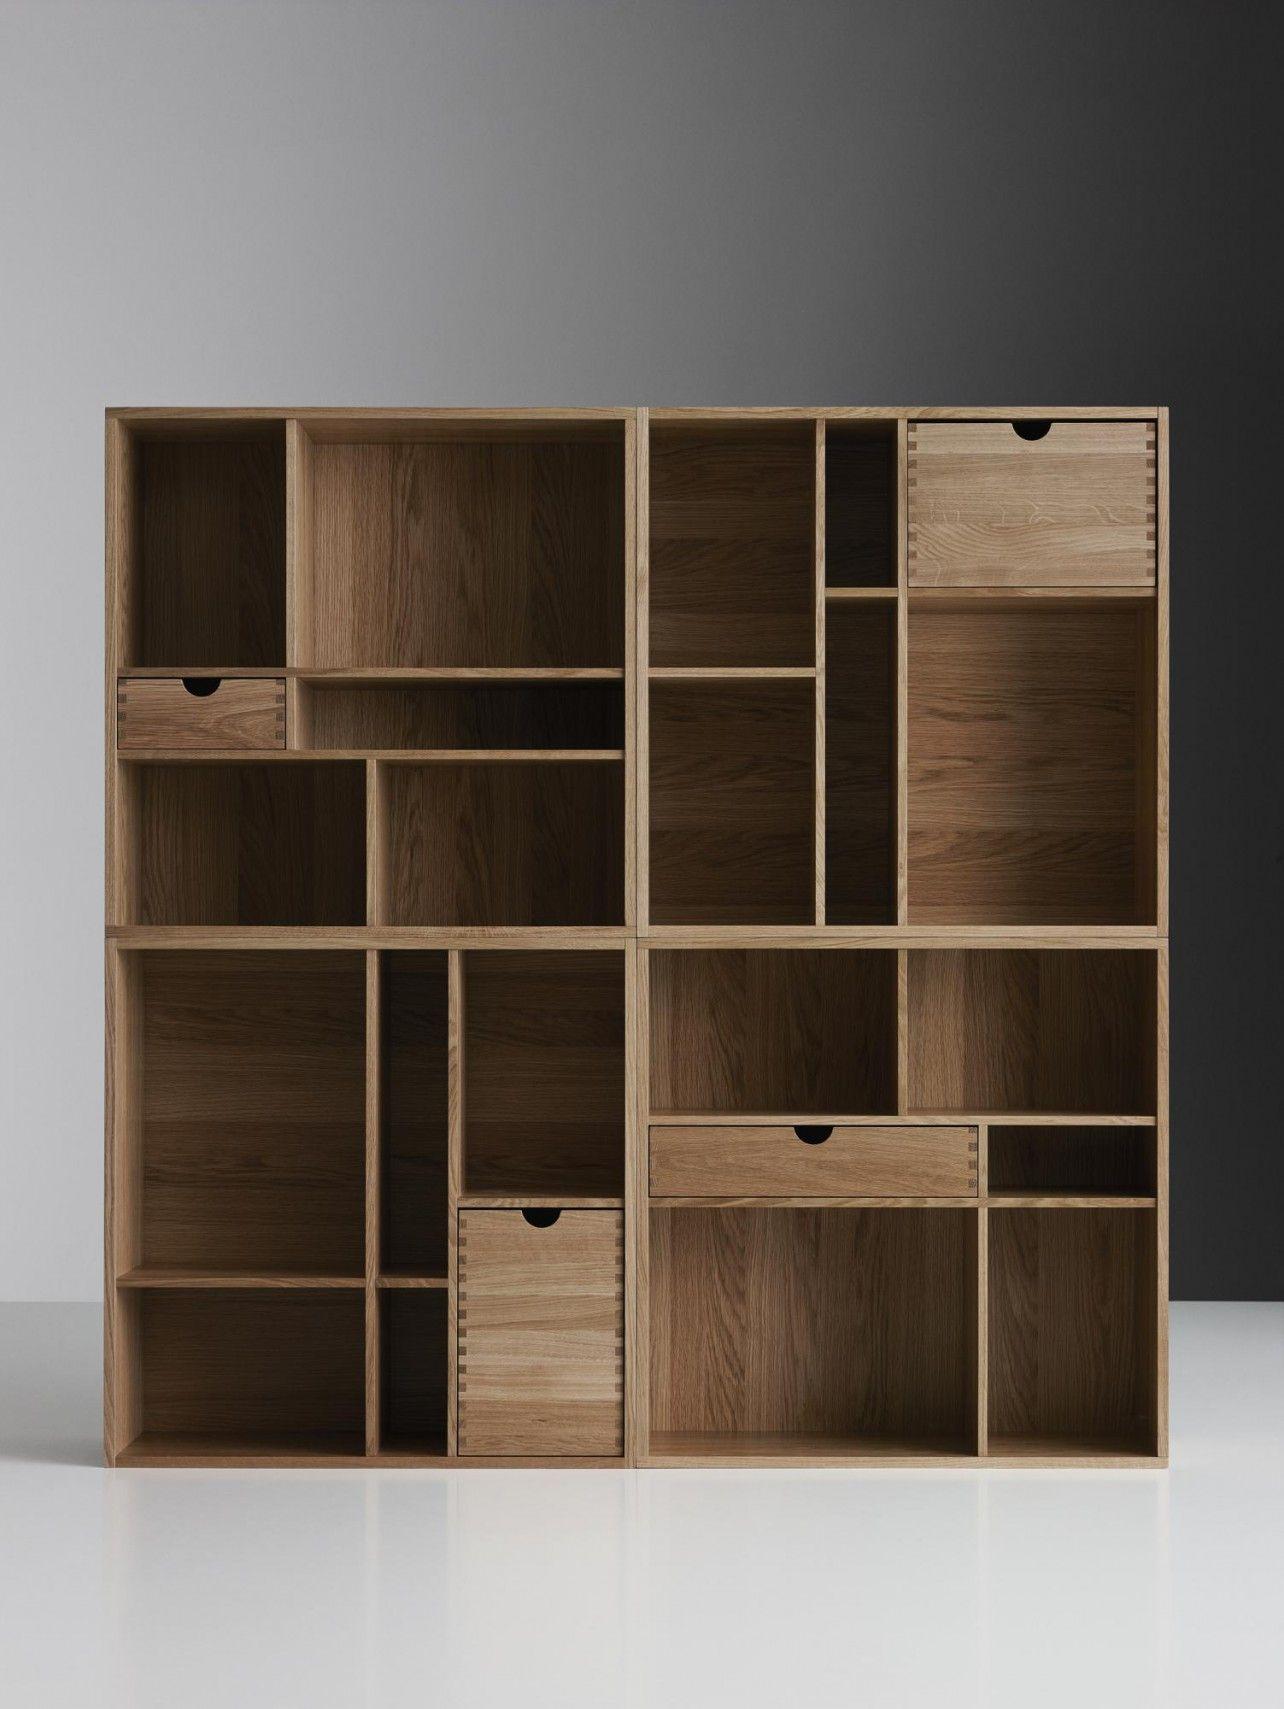 Fakta Swedese Scandinaviandesign Com Scandinavian Bookshelves Shelving Bookshelf Design